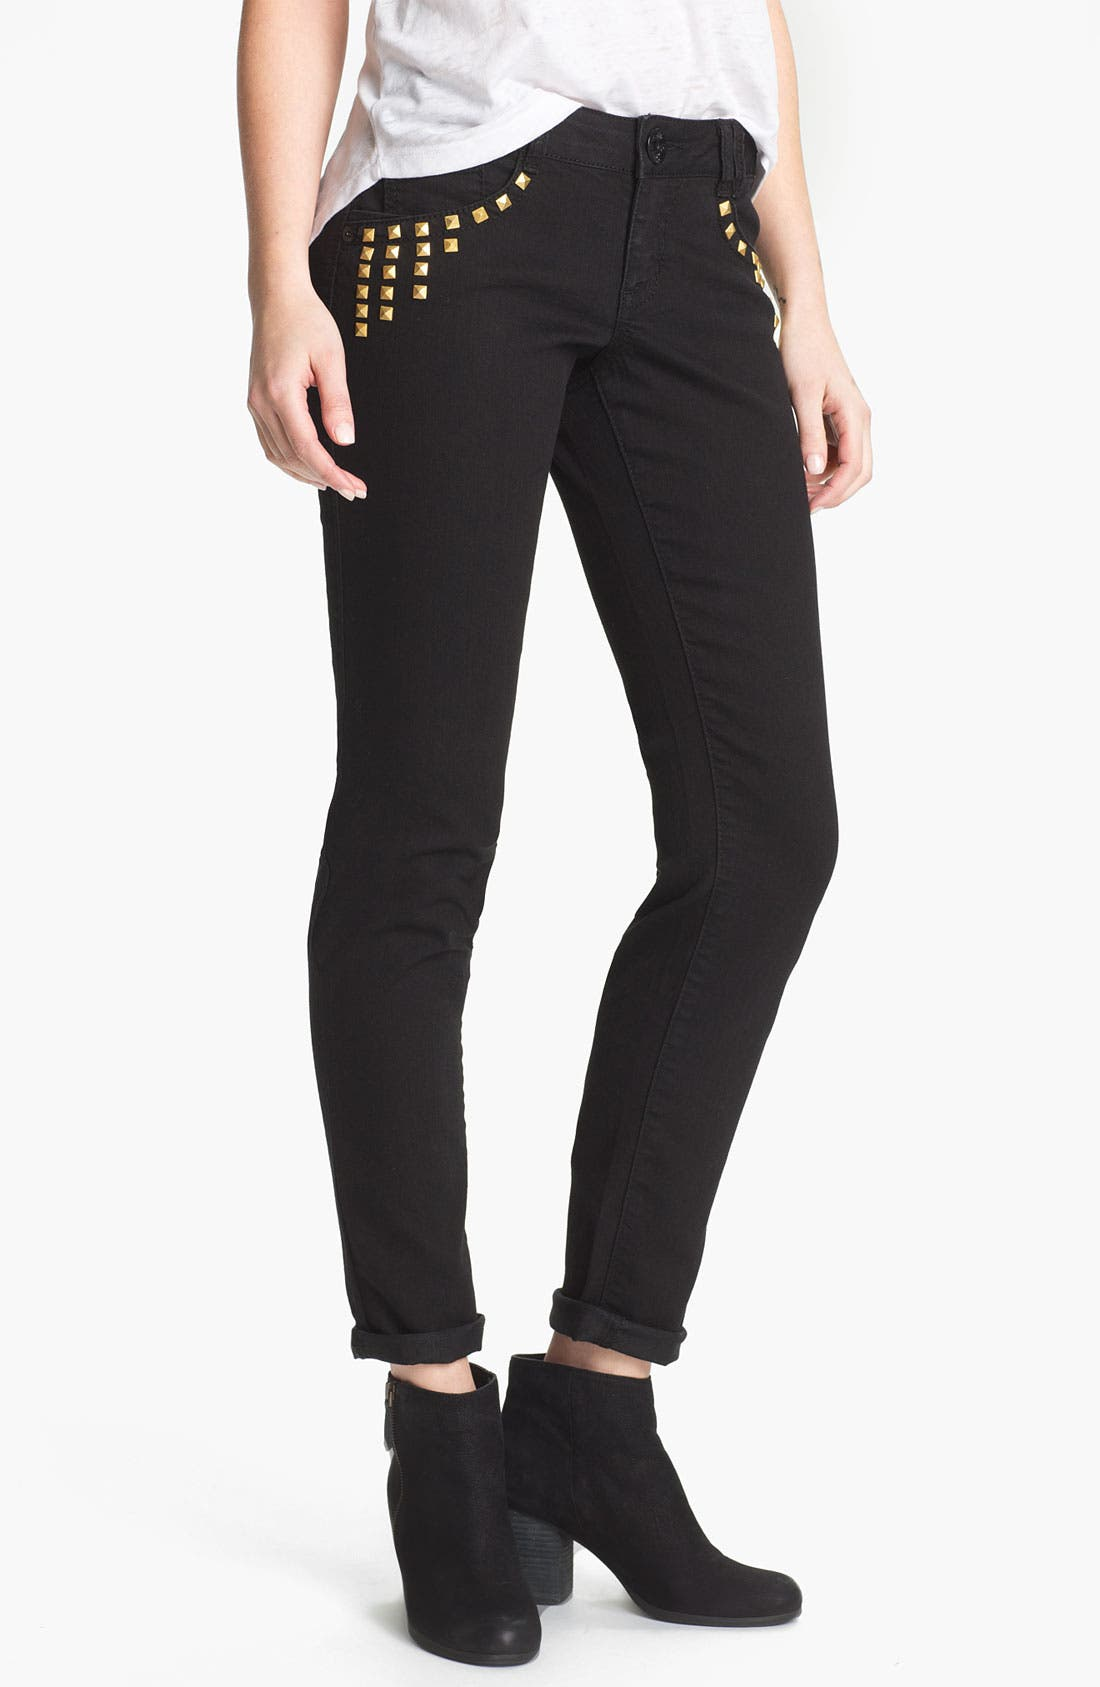 Main Image - Jolt Studded Skinny Jeans (Juniors)